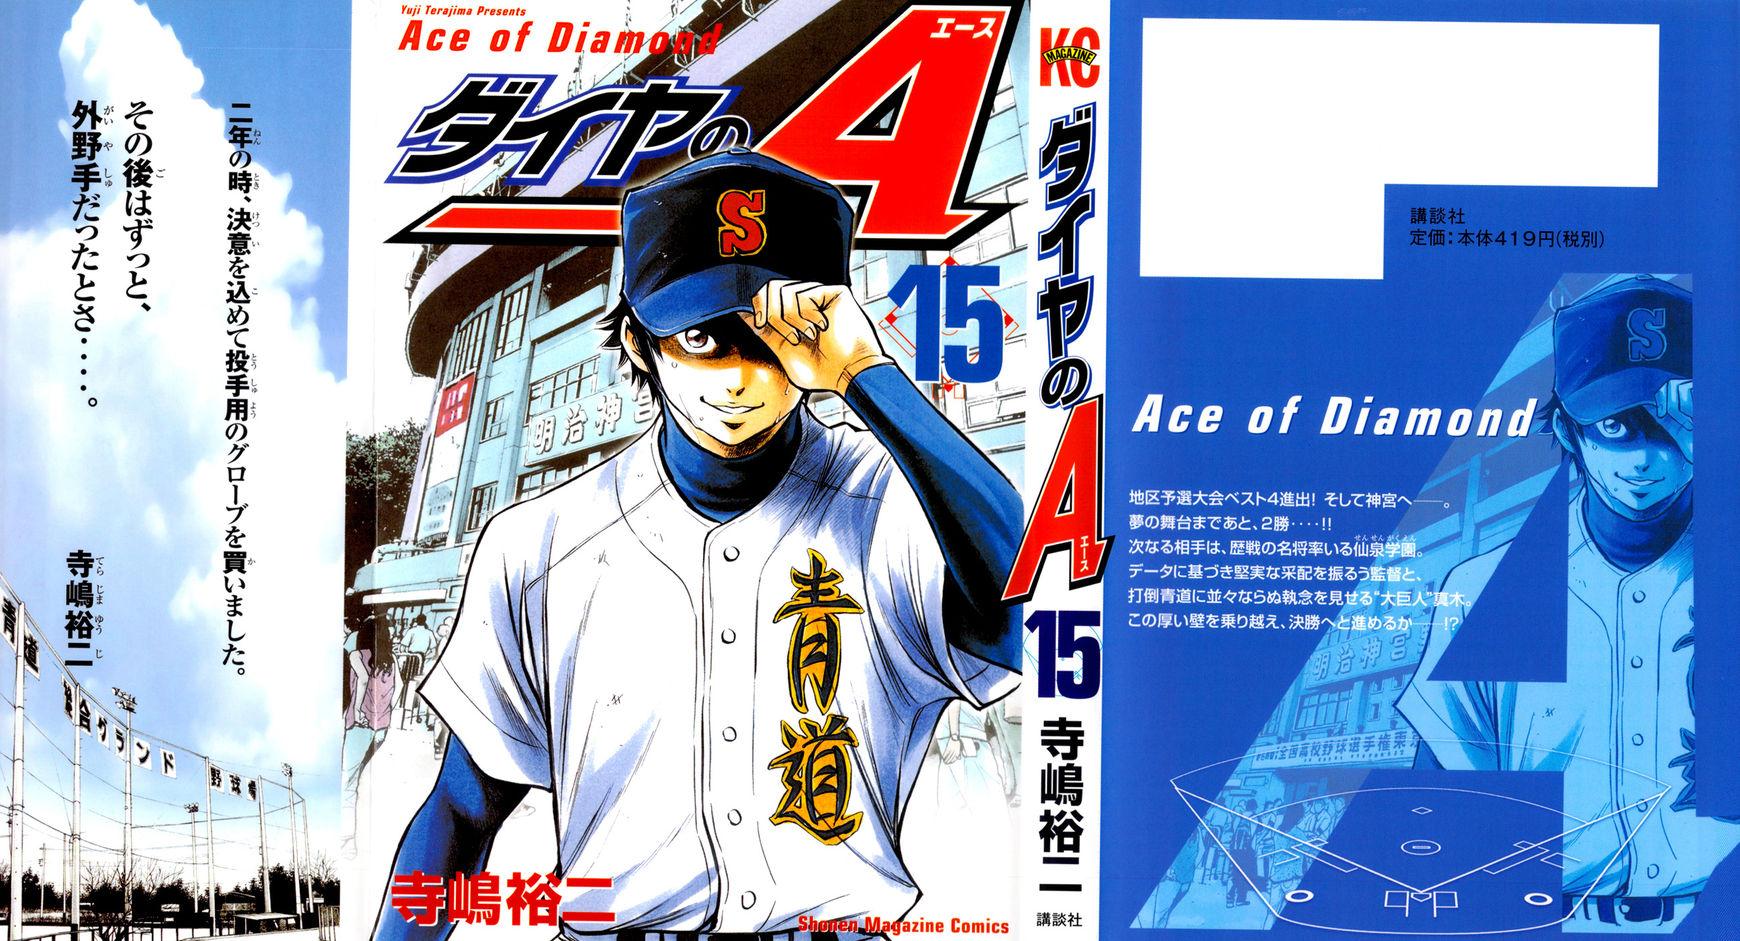 Diamond no Ace 121 Page 1